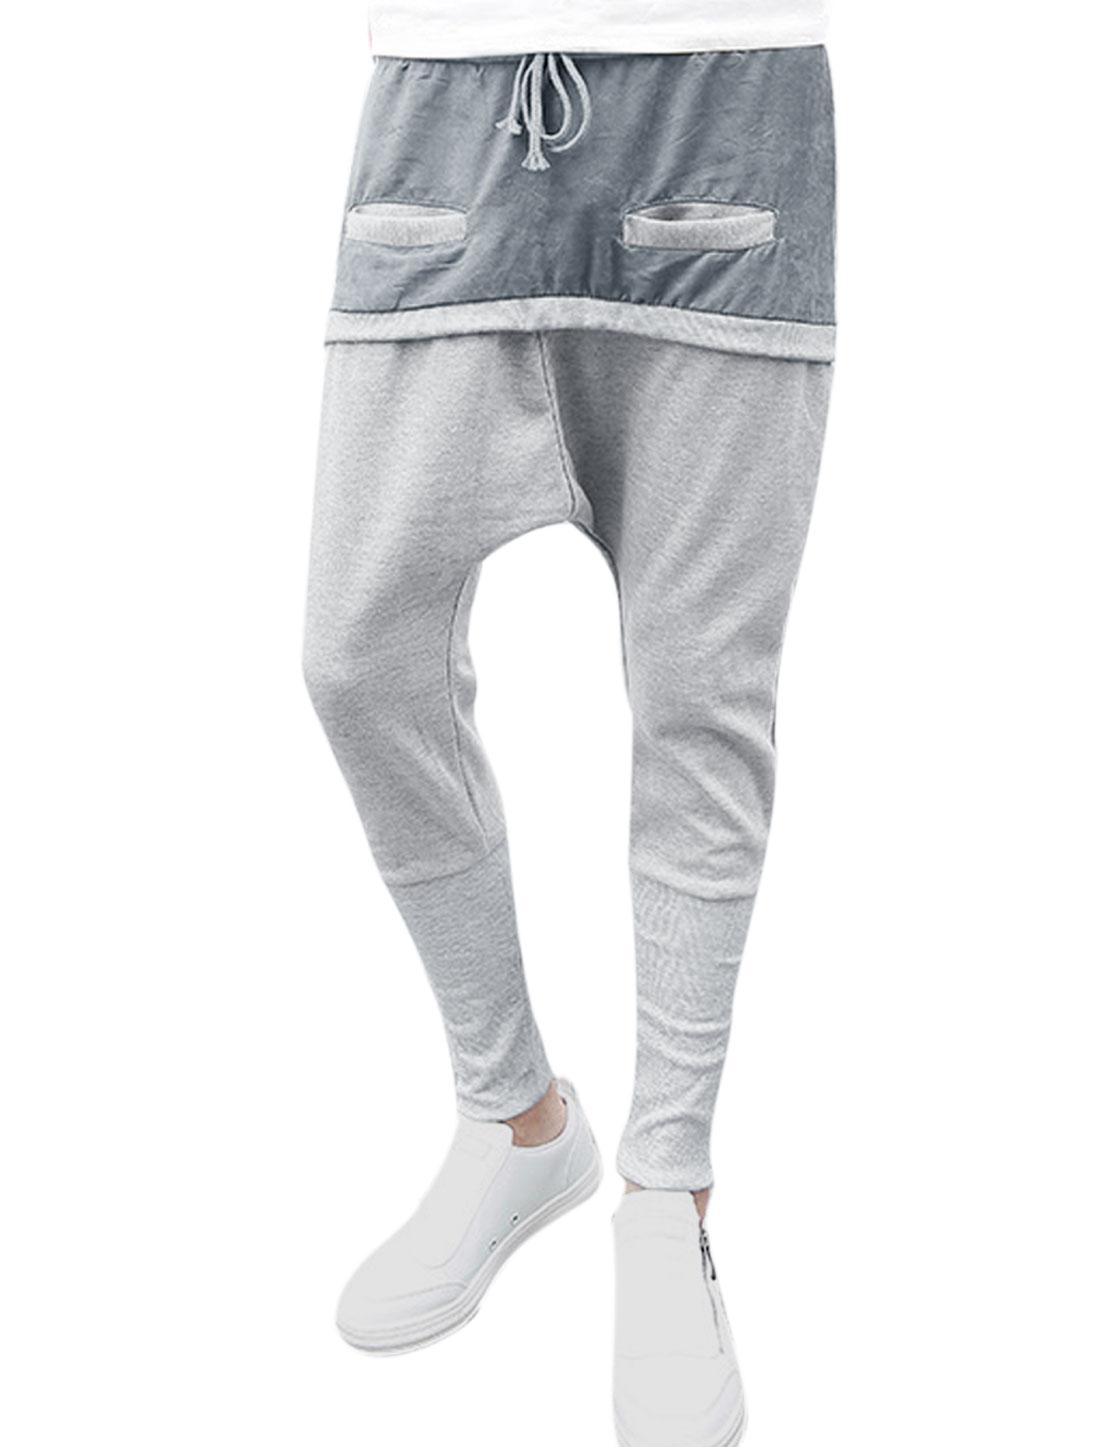 Men Hip-hop Crotch Splicing Front Pockets Loose Harem Trouses Light Gray W30